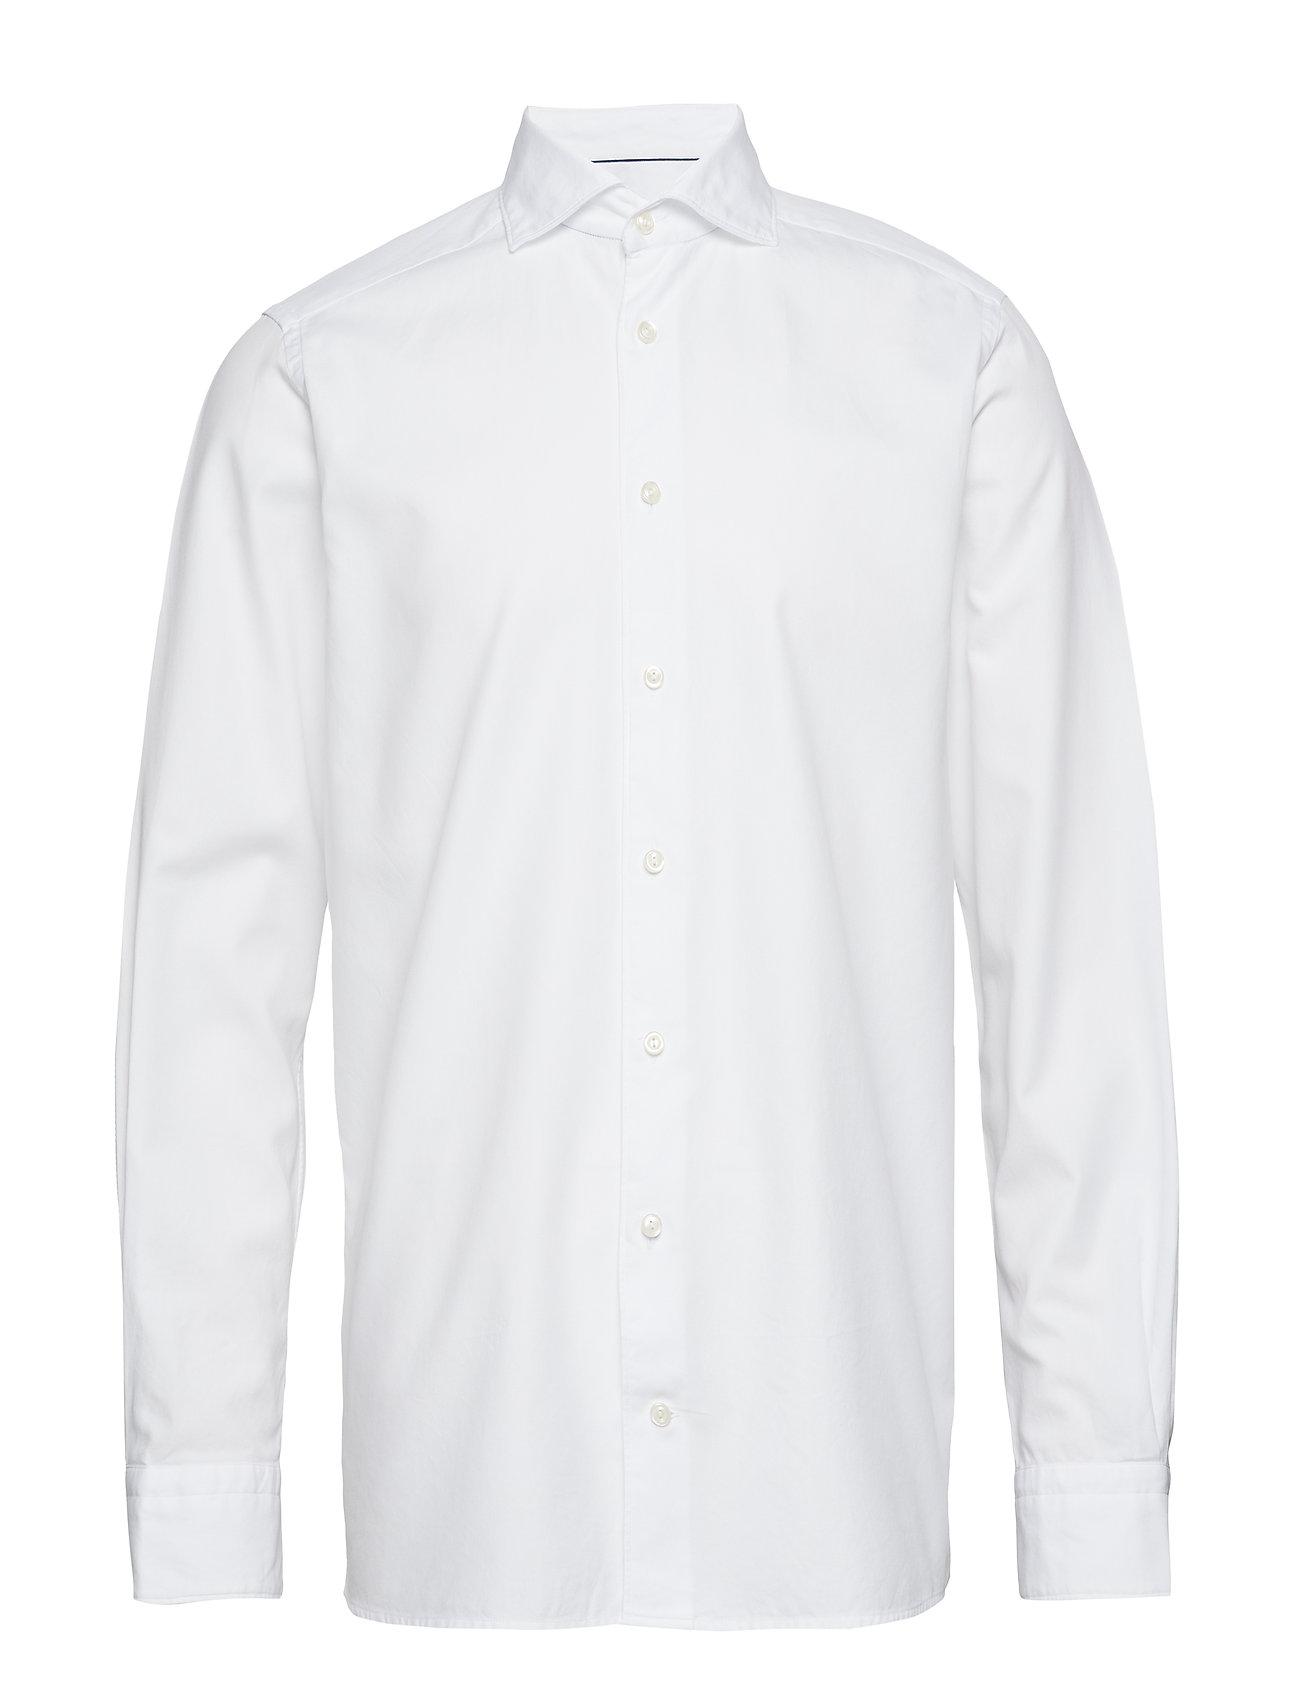 Eton Soft White Micro Weave Twill Shirt - WHITE